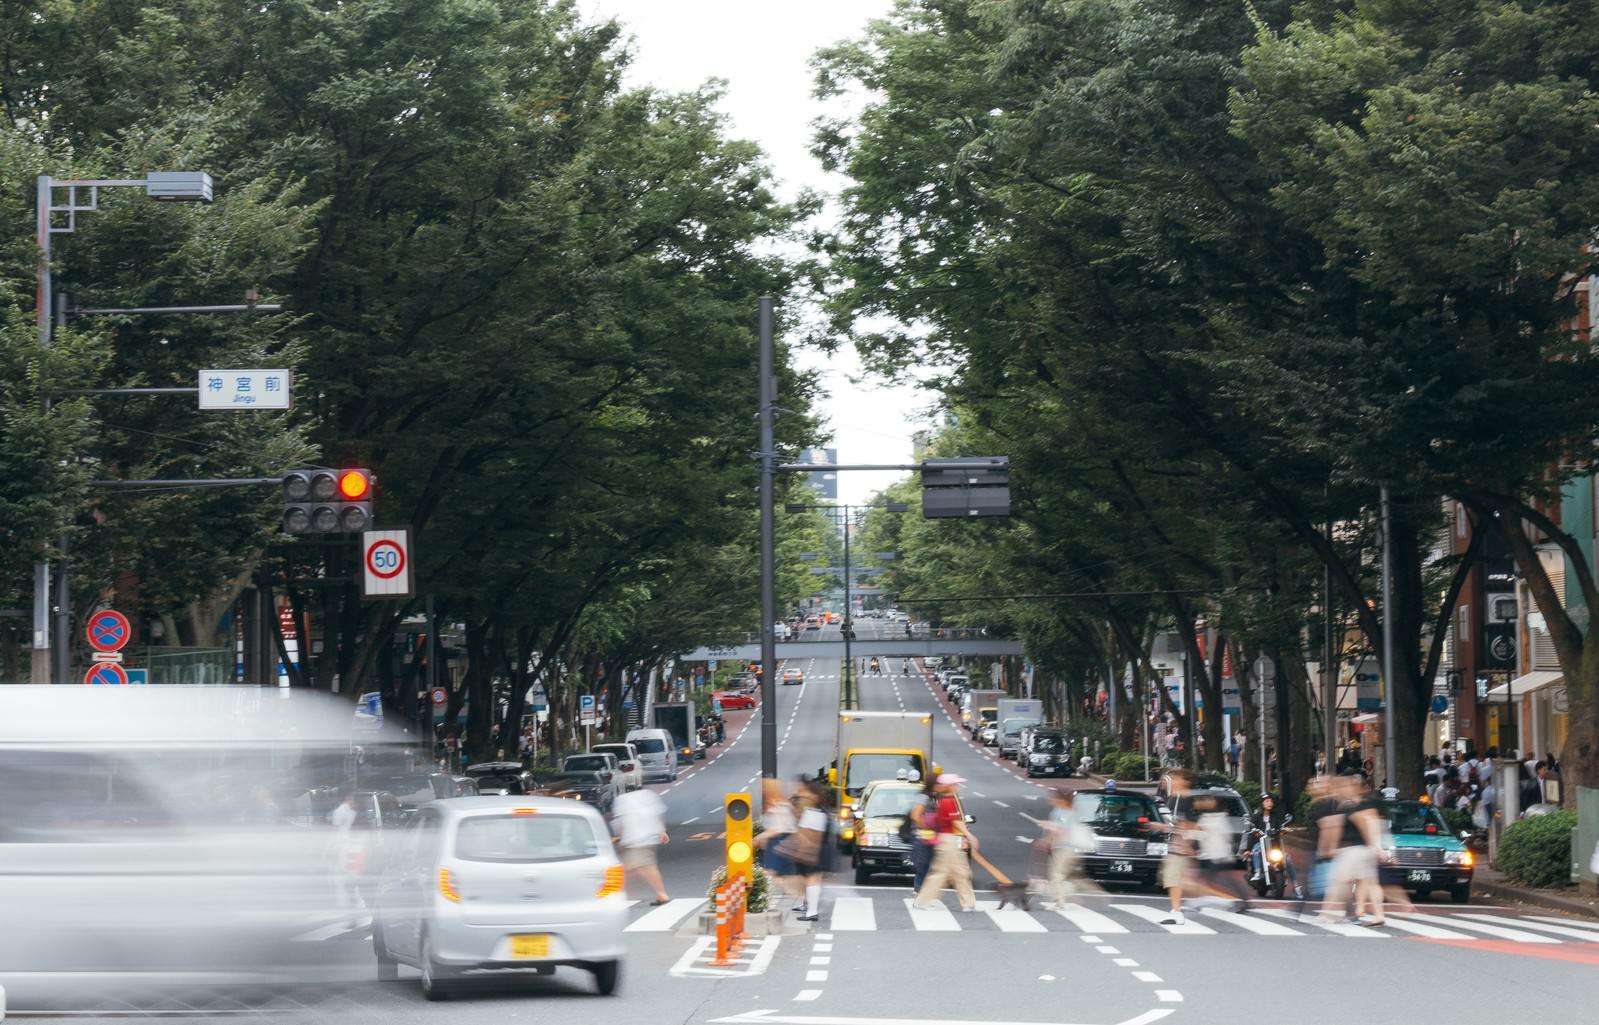 「神宮前交差点」の写真